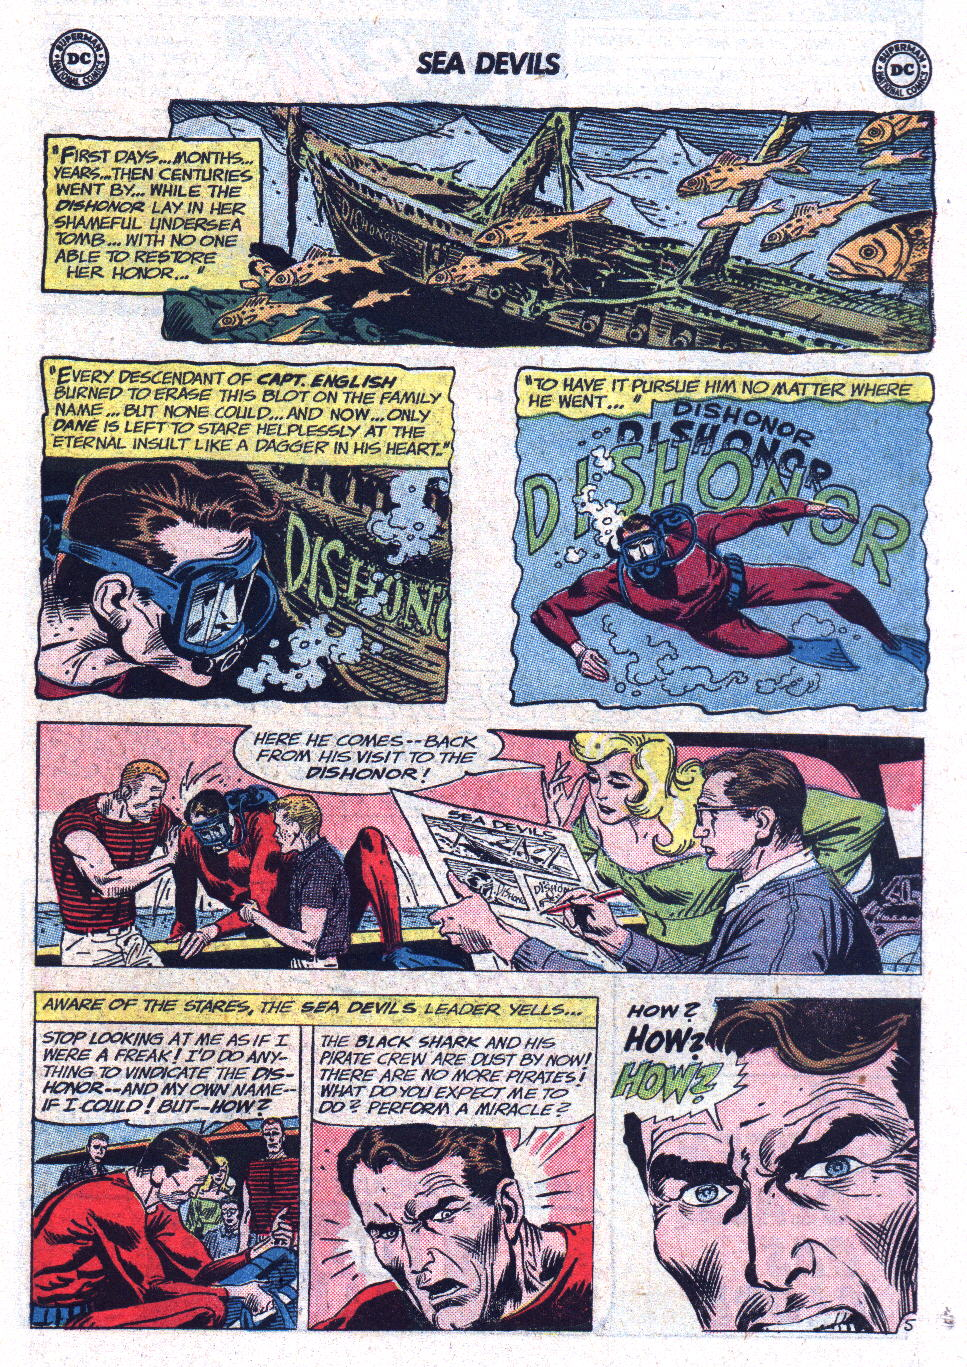 Read online Sea Devils comic -  Issue #13 - 7